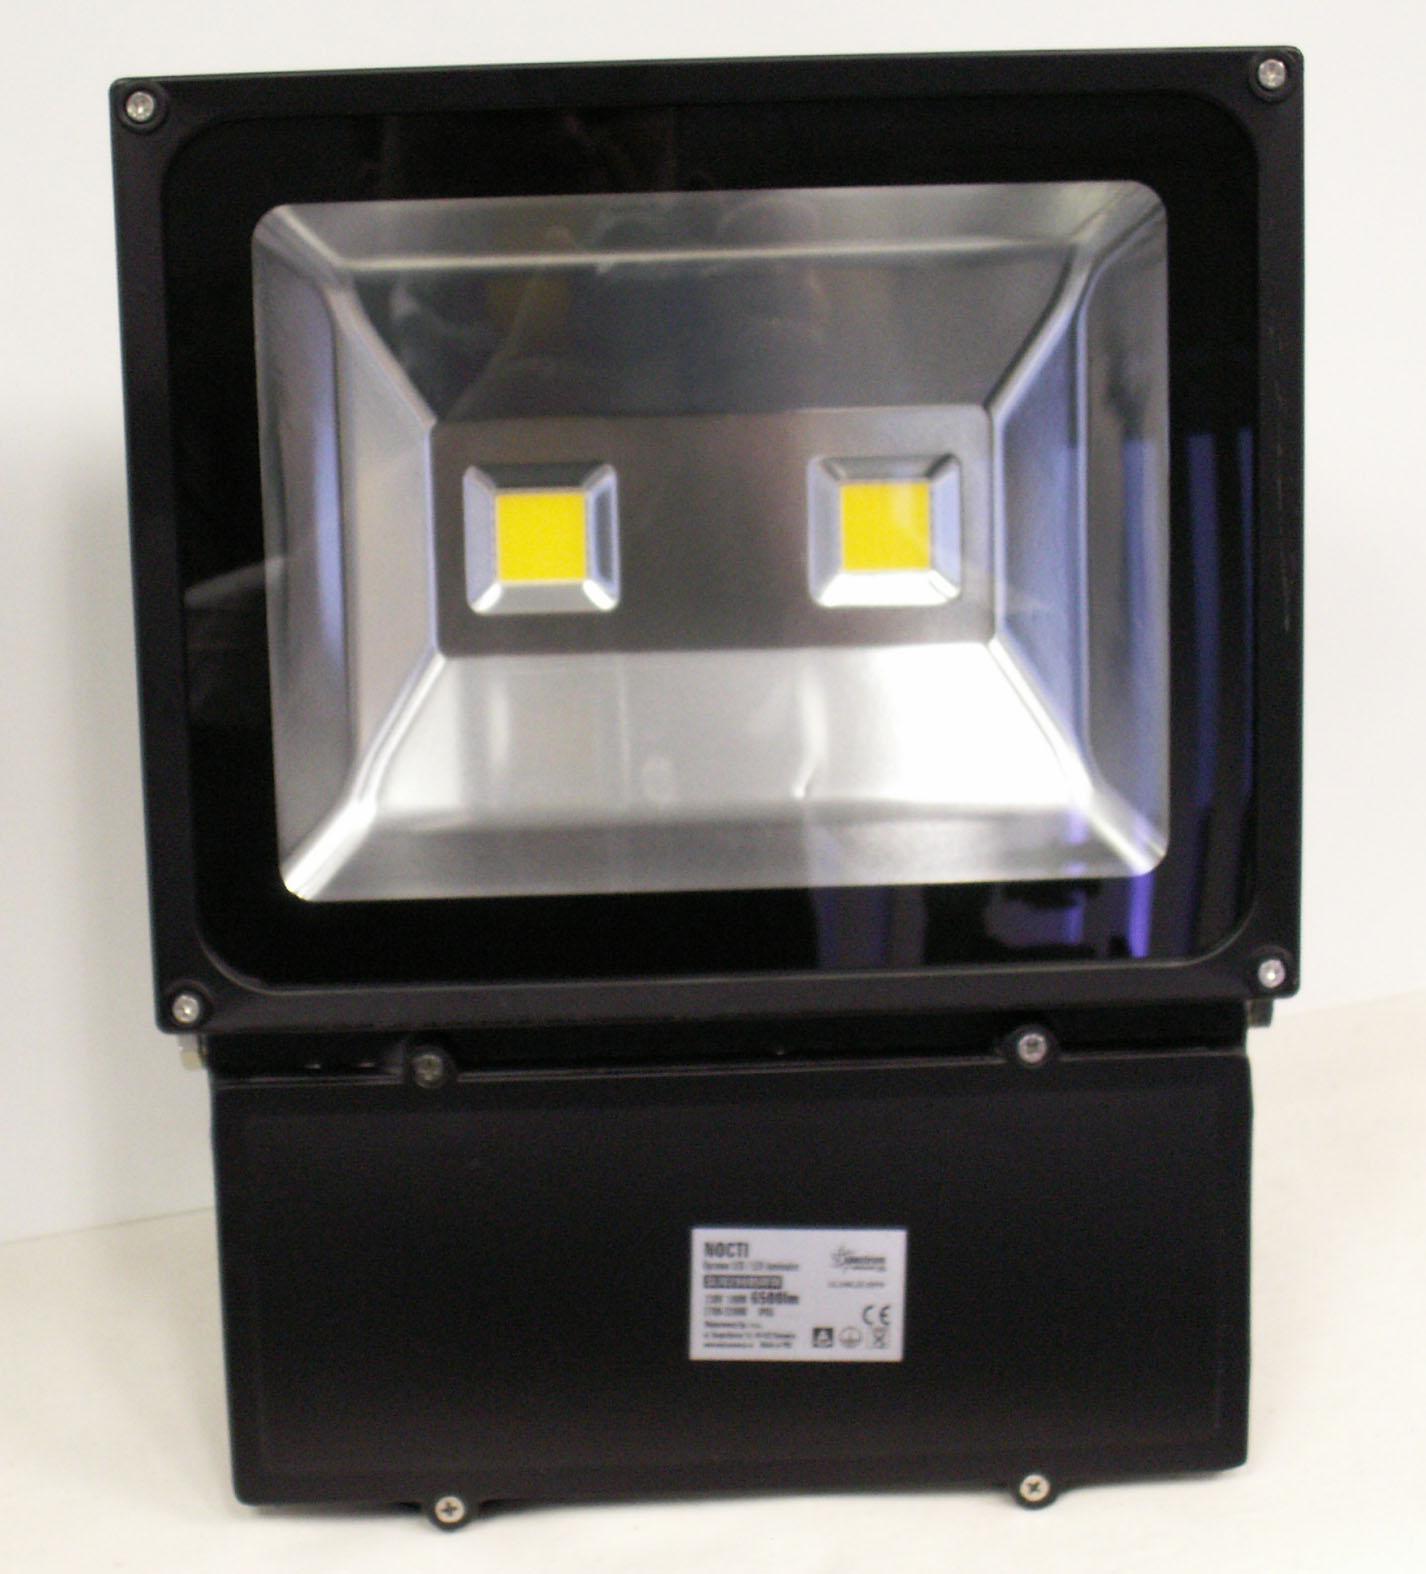 led-fluter-004627 Wunderschöne Led Lampen 100 Watt Dekorationen